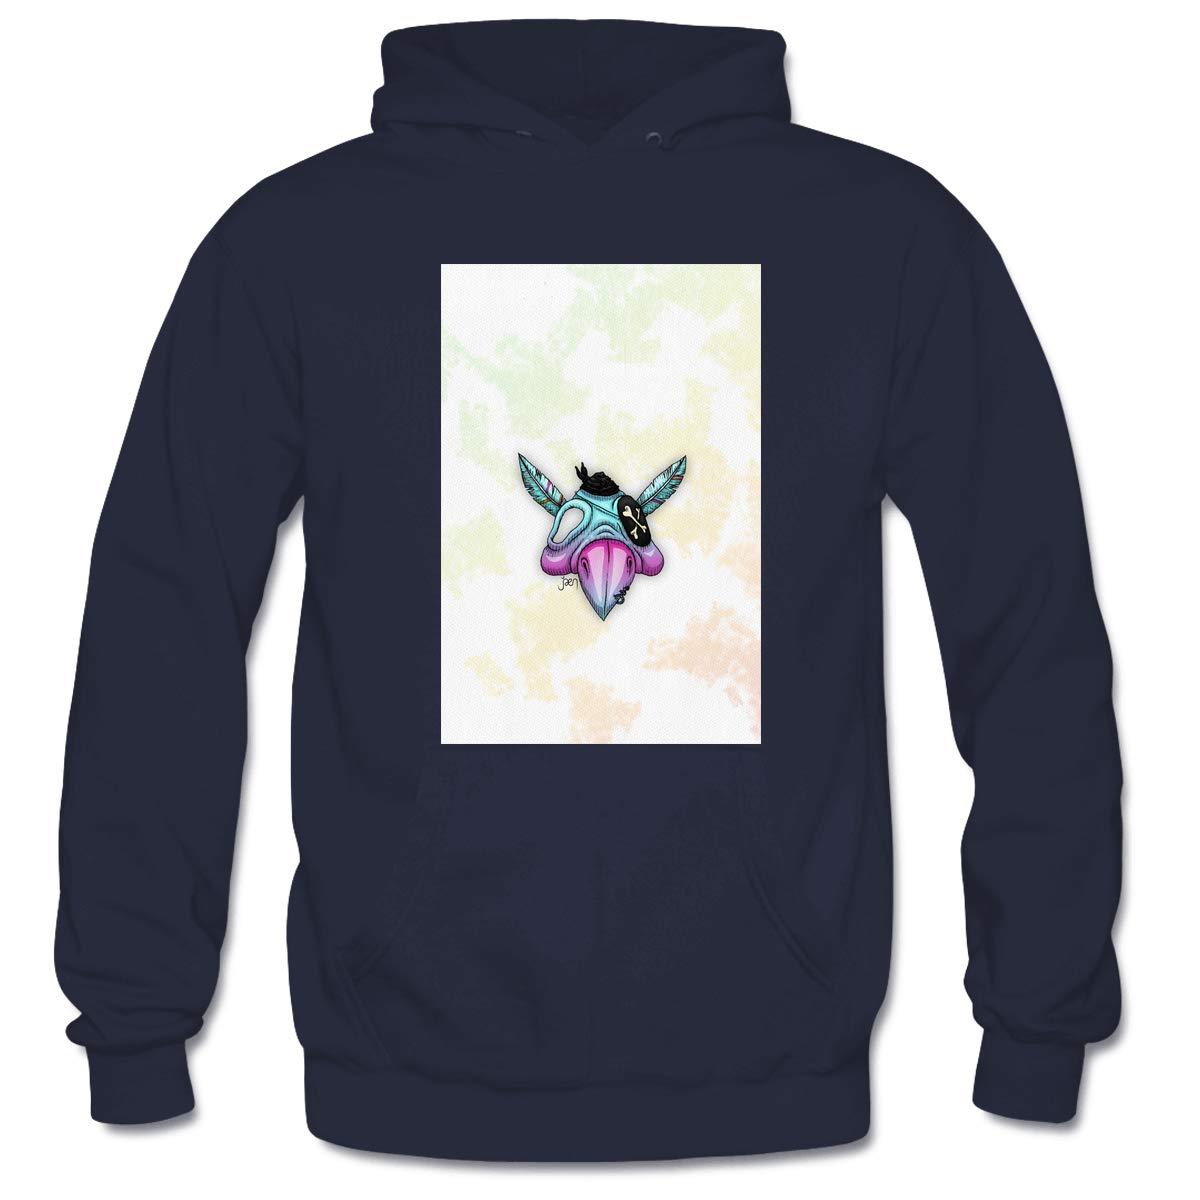 Mens Psittaskull Hooded Sweatshirt Funny Printed Pullover Hoodies Classic Long Sleeve T Shirt Tops